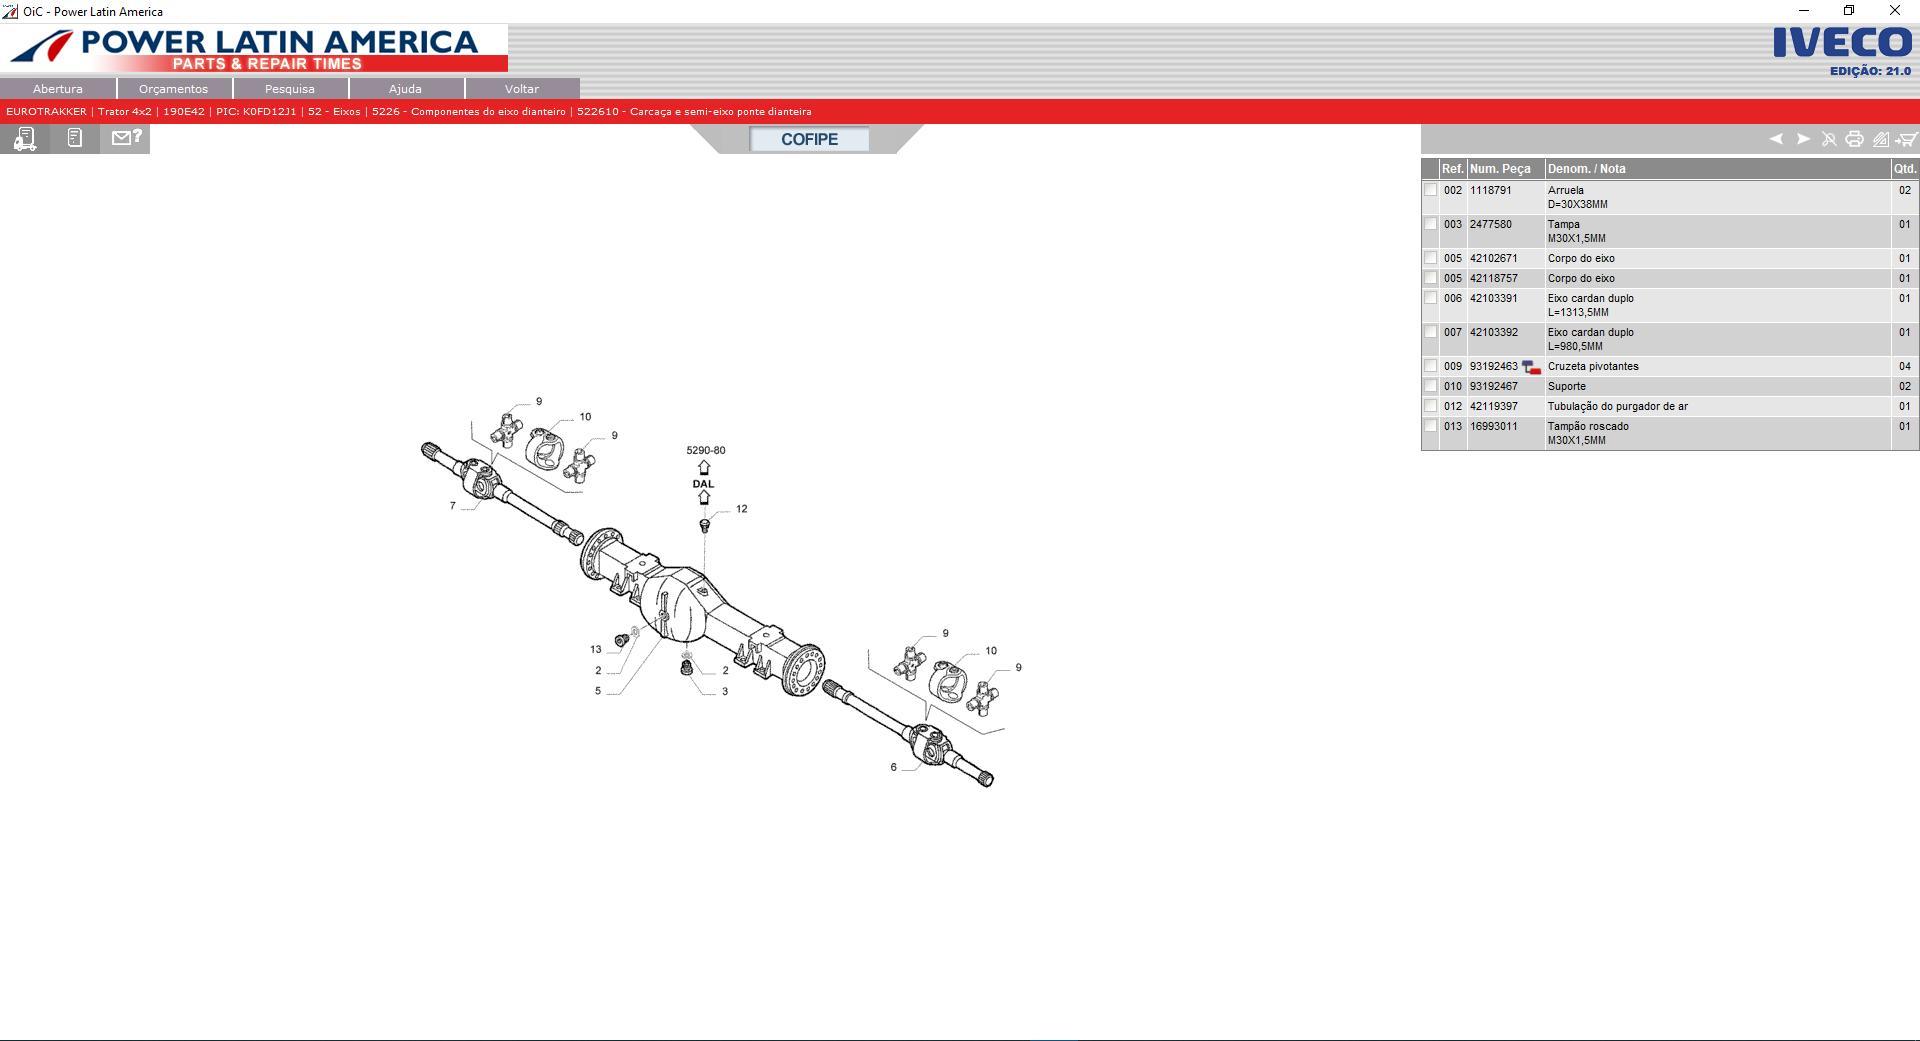 Iveco_Power_Latin_America_OIC_032020_EPC_Spare_Parts_Catalog9